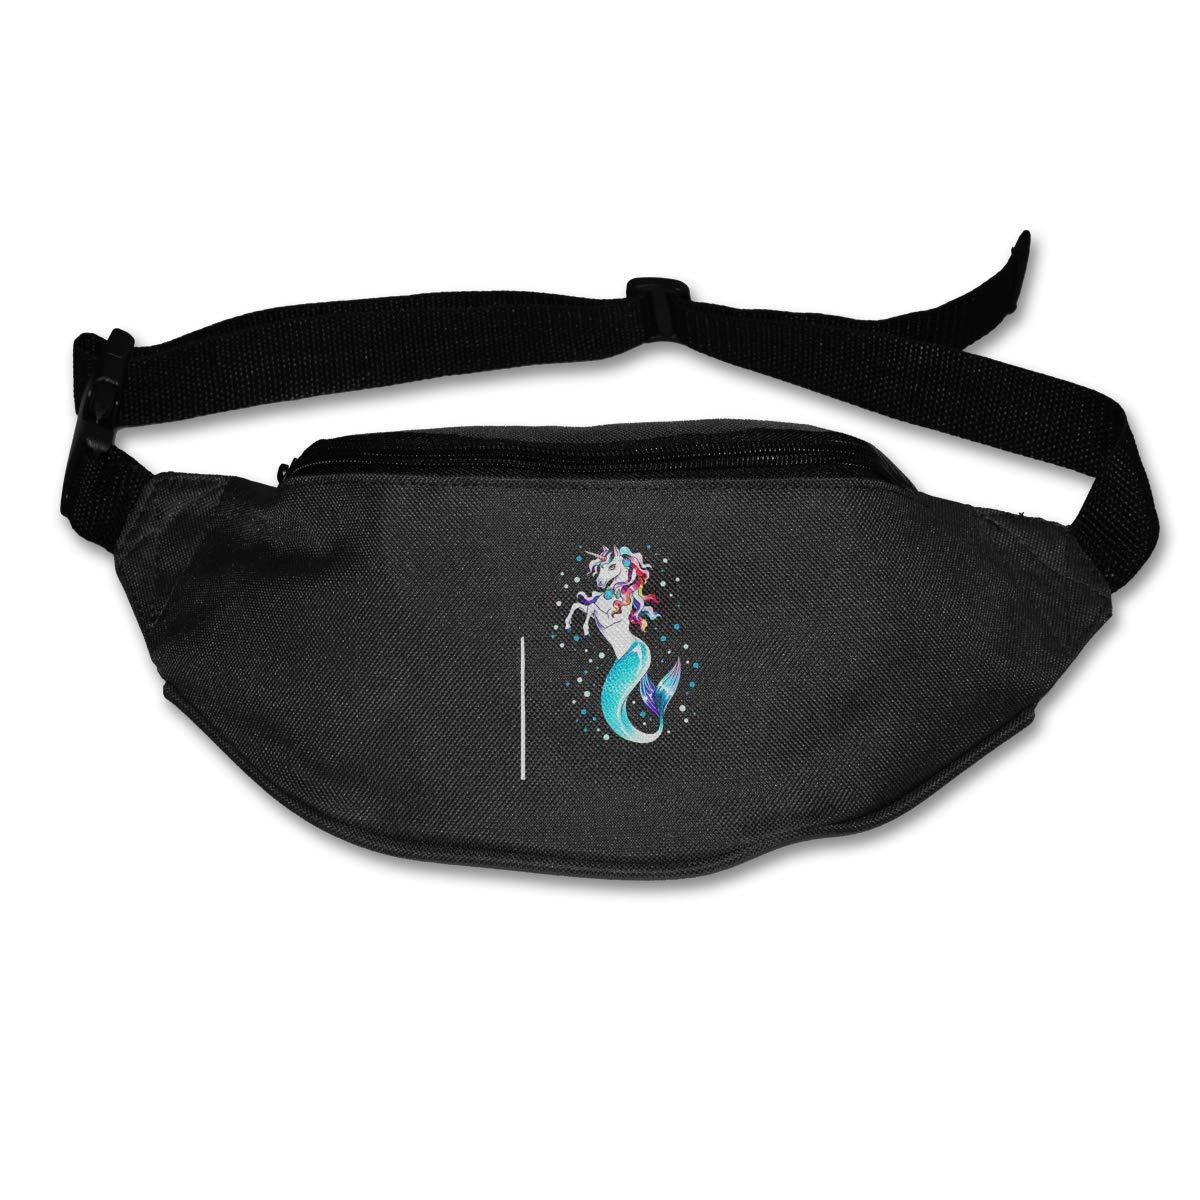 Cute Unicorn Mermaid Sport Waist Packs Fanny Pack Adjustable For Hike